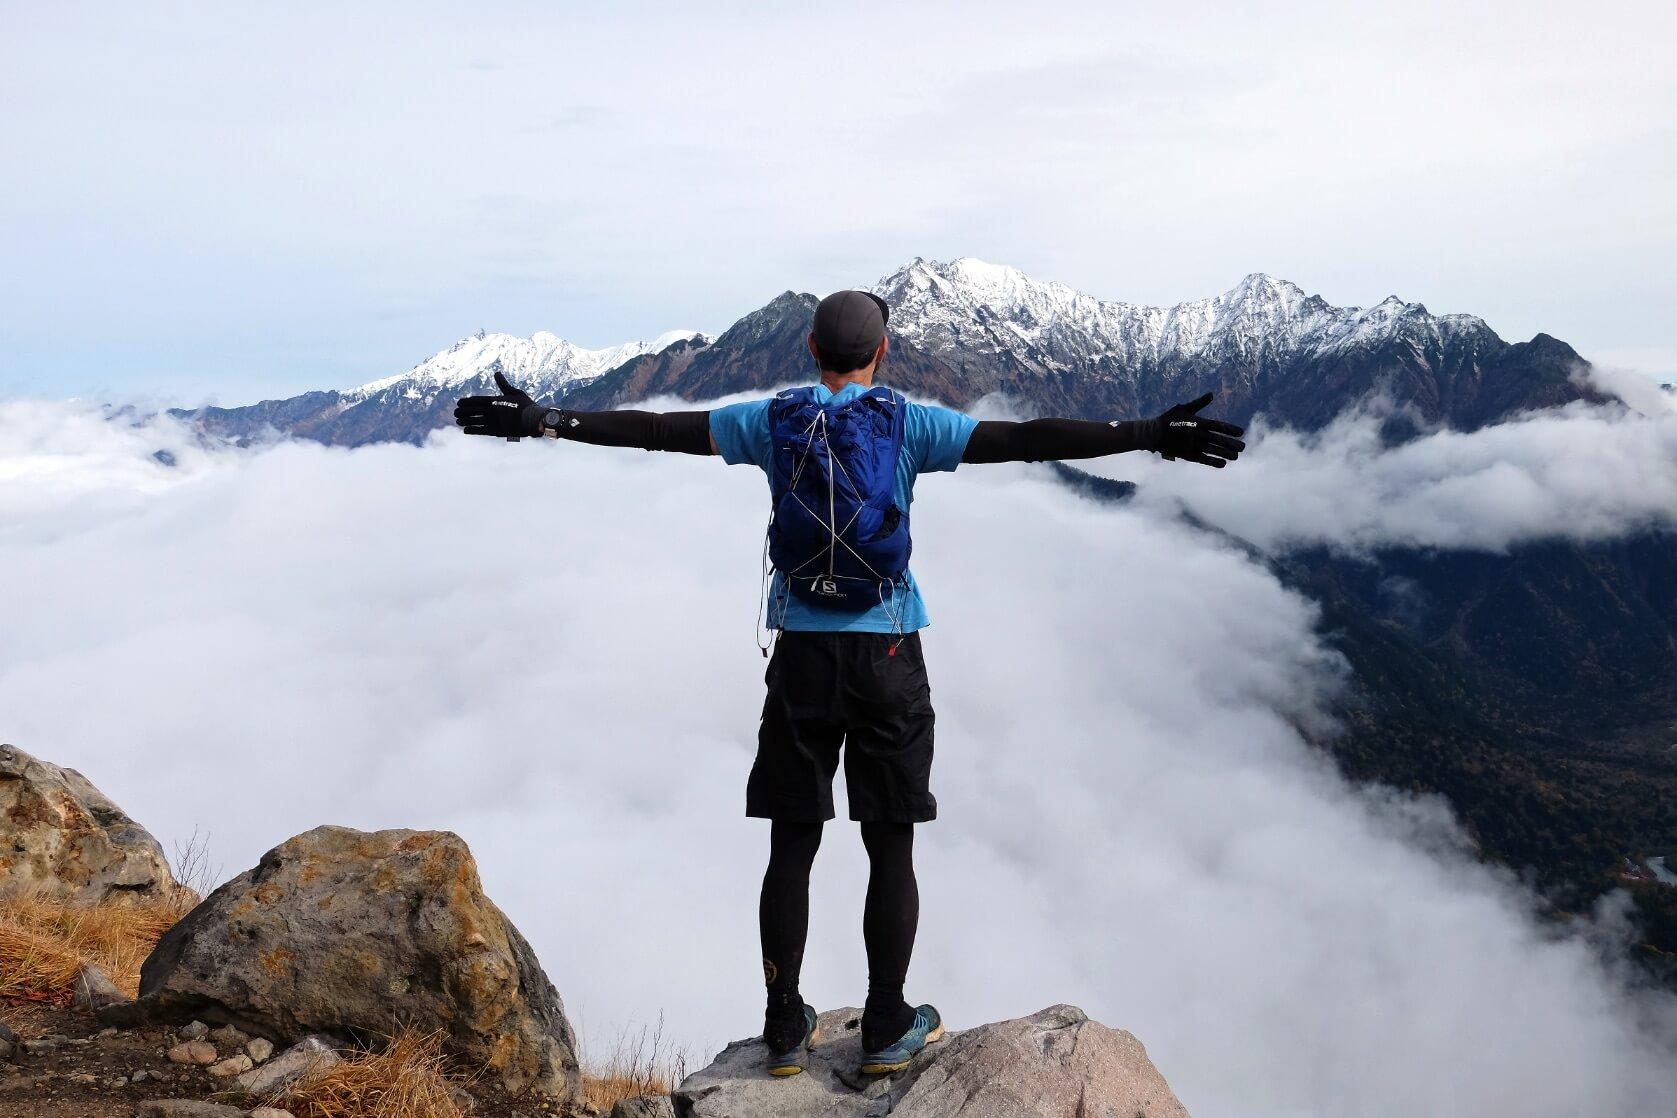 The Snowcapped Hotaka Range from Mt. Yake, Northern Alps, Nagano